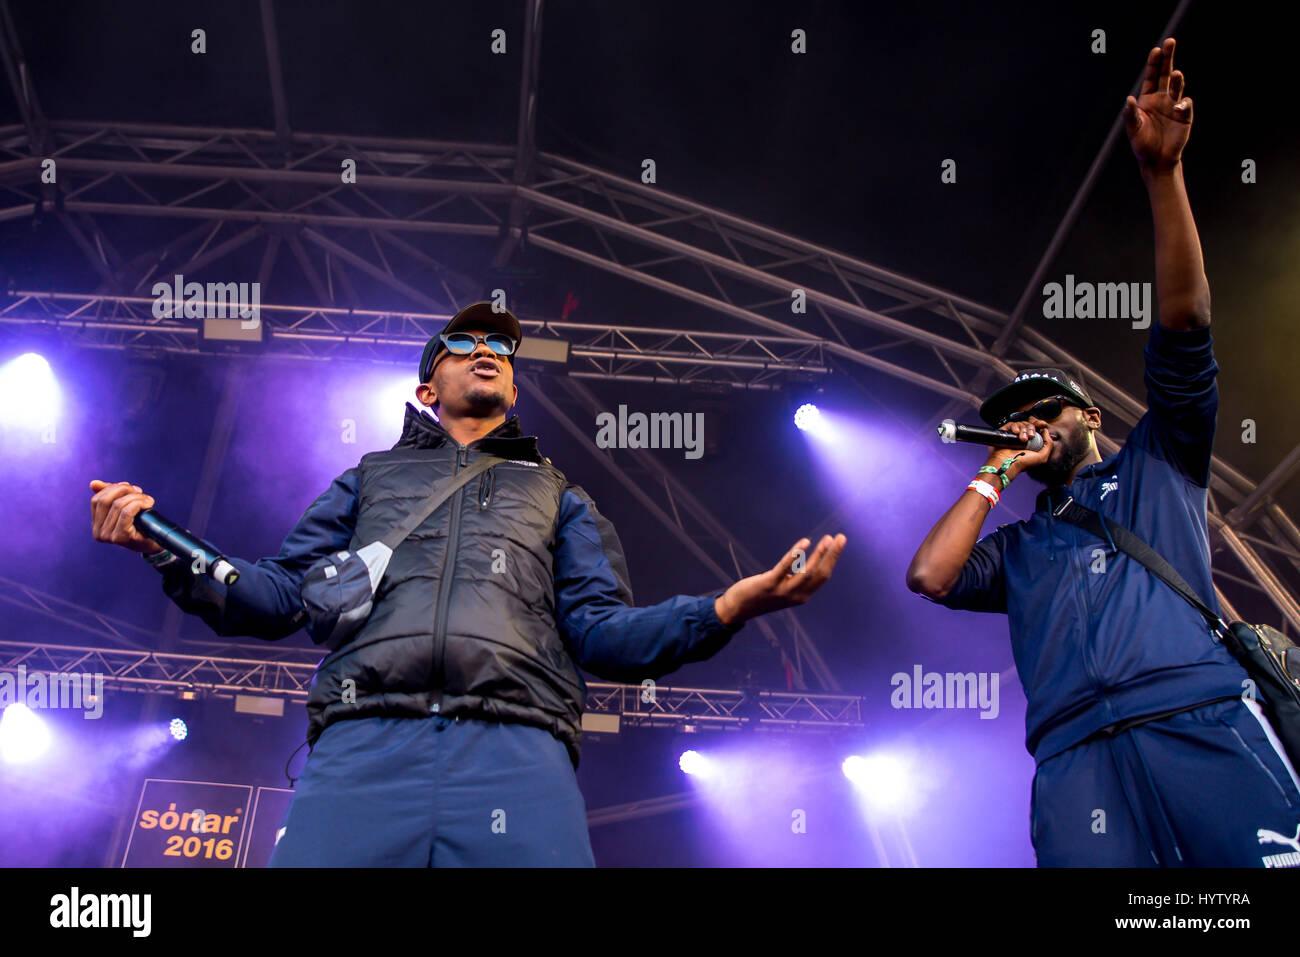 BARCELONA - JUN 18: Section Boyz (rap band) perform in concert at Sonar Festival on June 18, 2016 in Barcelona, Stock Photo